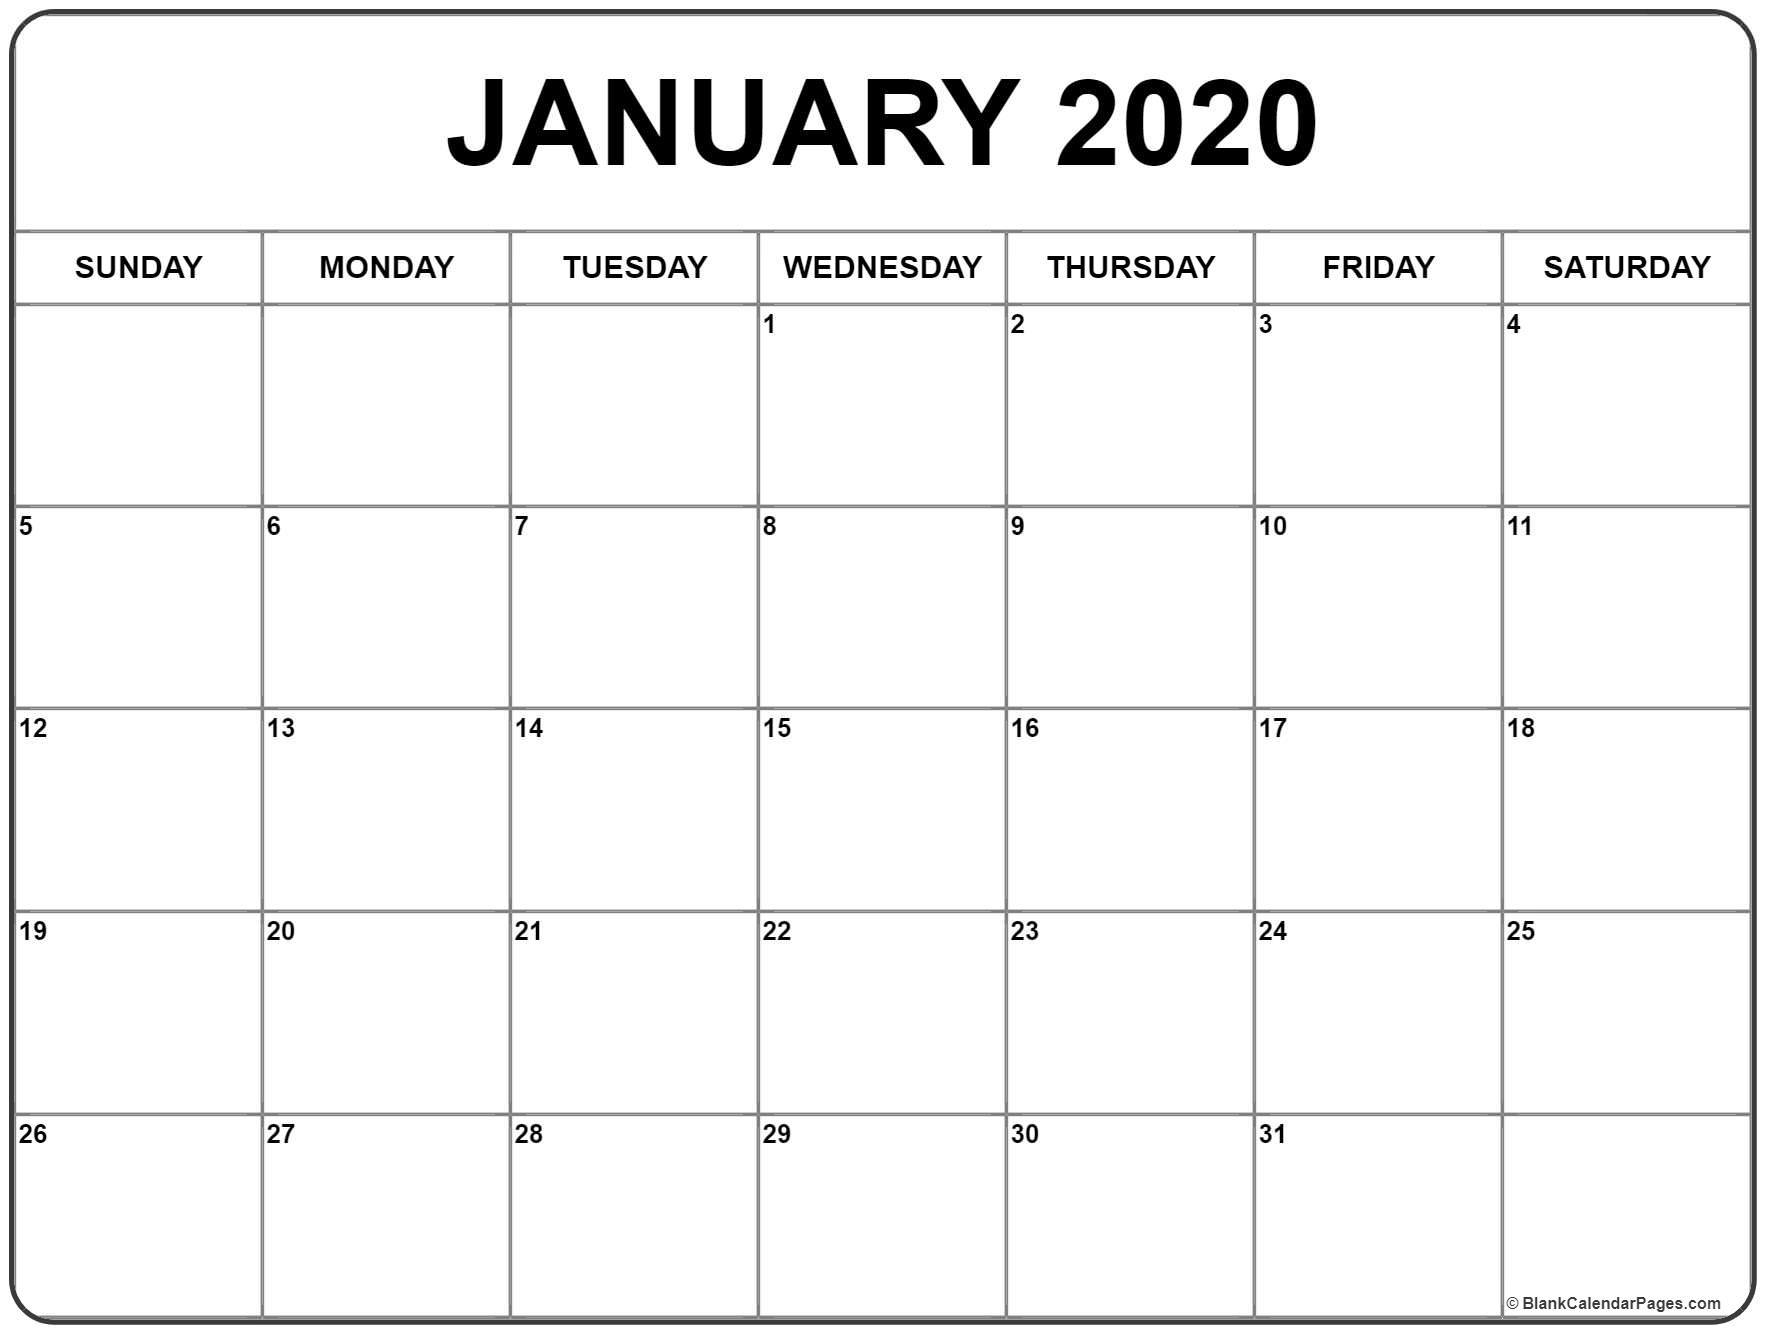 8.5 X 11 Calendar Template - Calendar Inspiration Design pertaining to 8.5 X 11 Printable 2020 Calendar